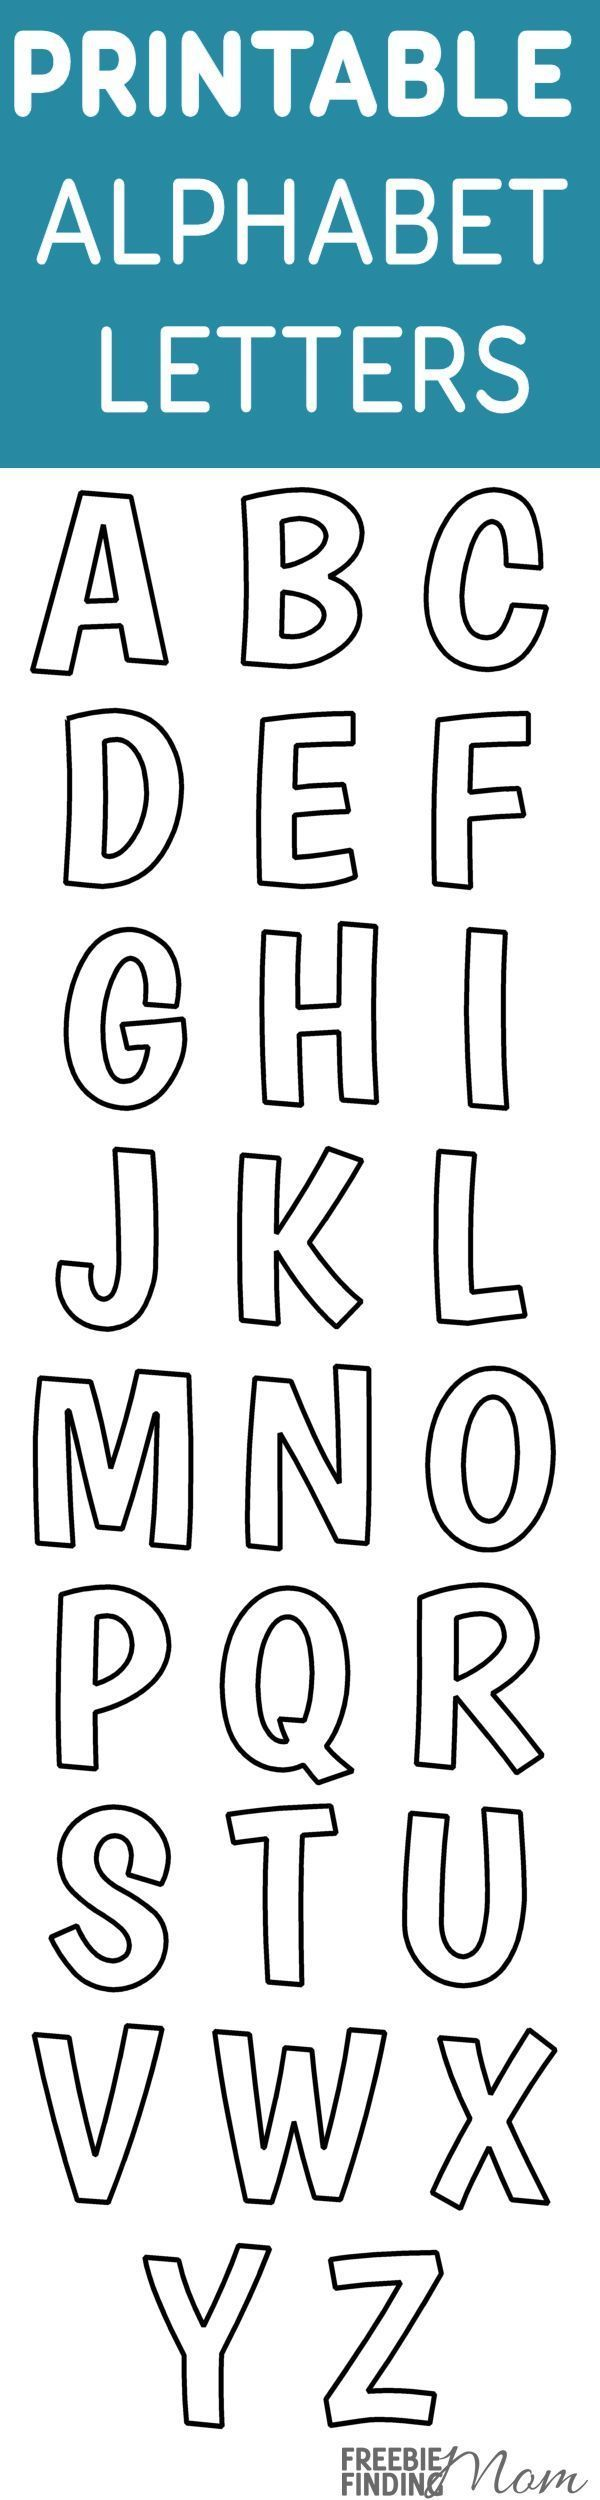 Superb Printable FREE Alphabet Templates   Alphabet Templates, Free Printables And  Homeschool